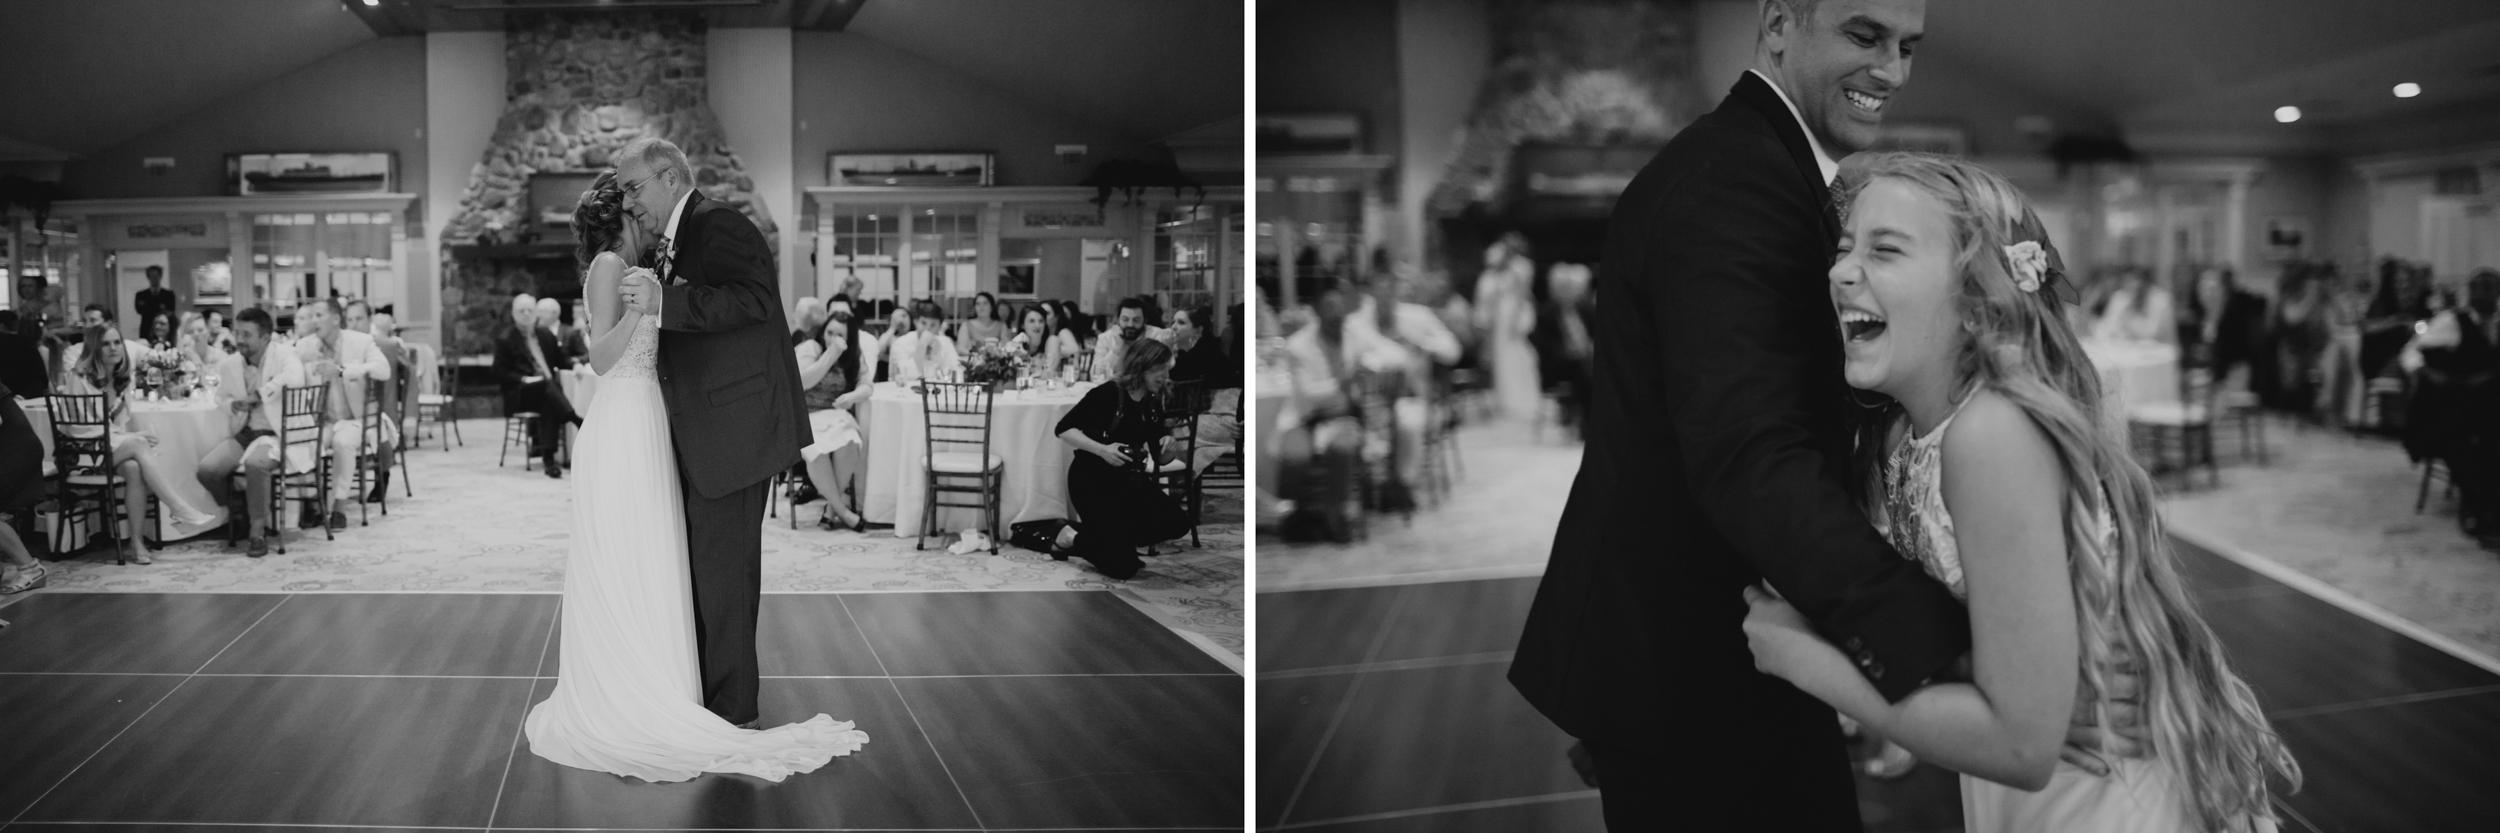 point_lookout_northport_Maine_Midcoast_wedding_leslie_justin-25.jpg